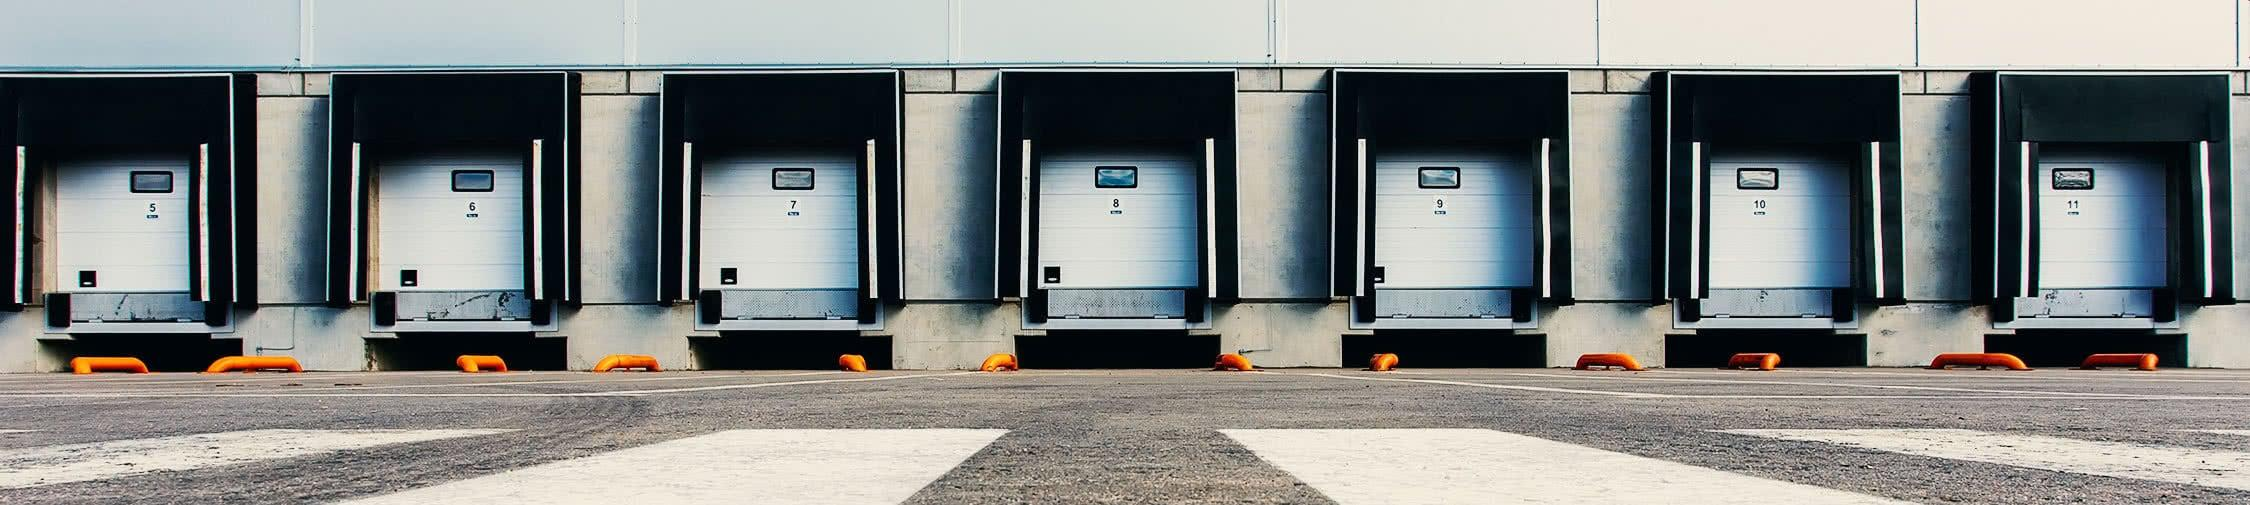 trailer-unloading-services